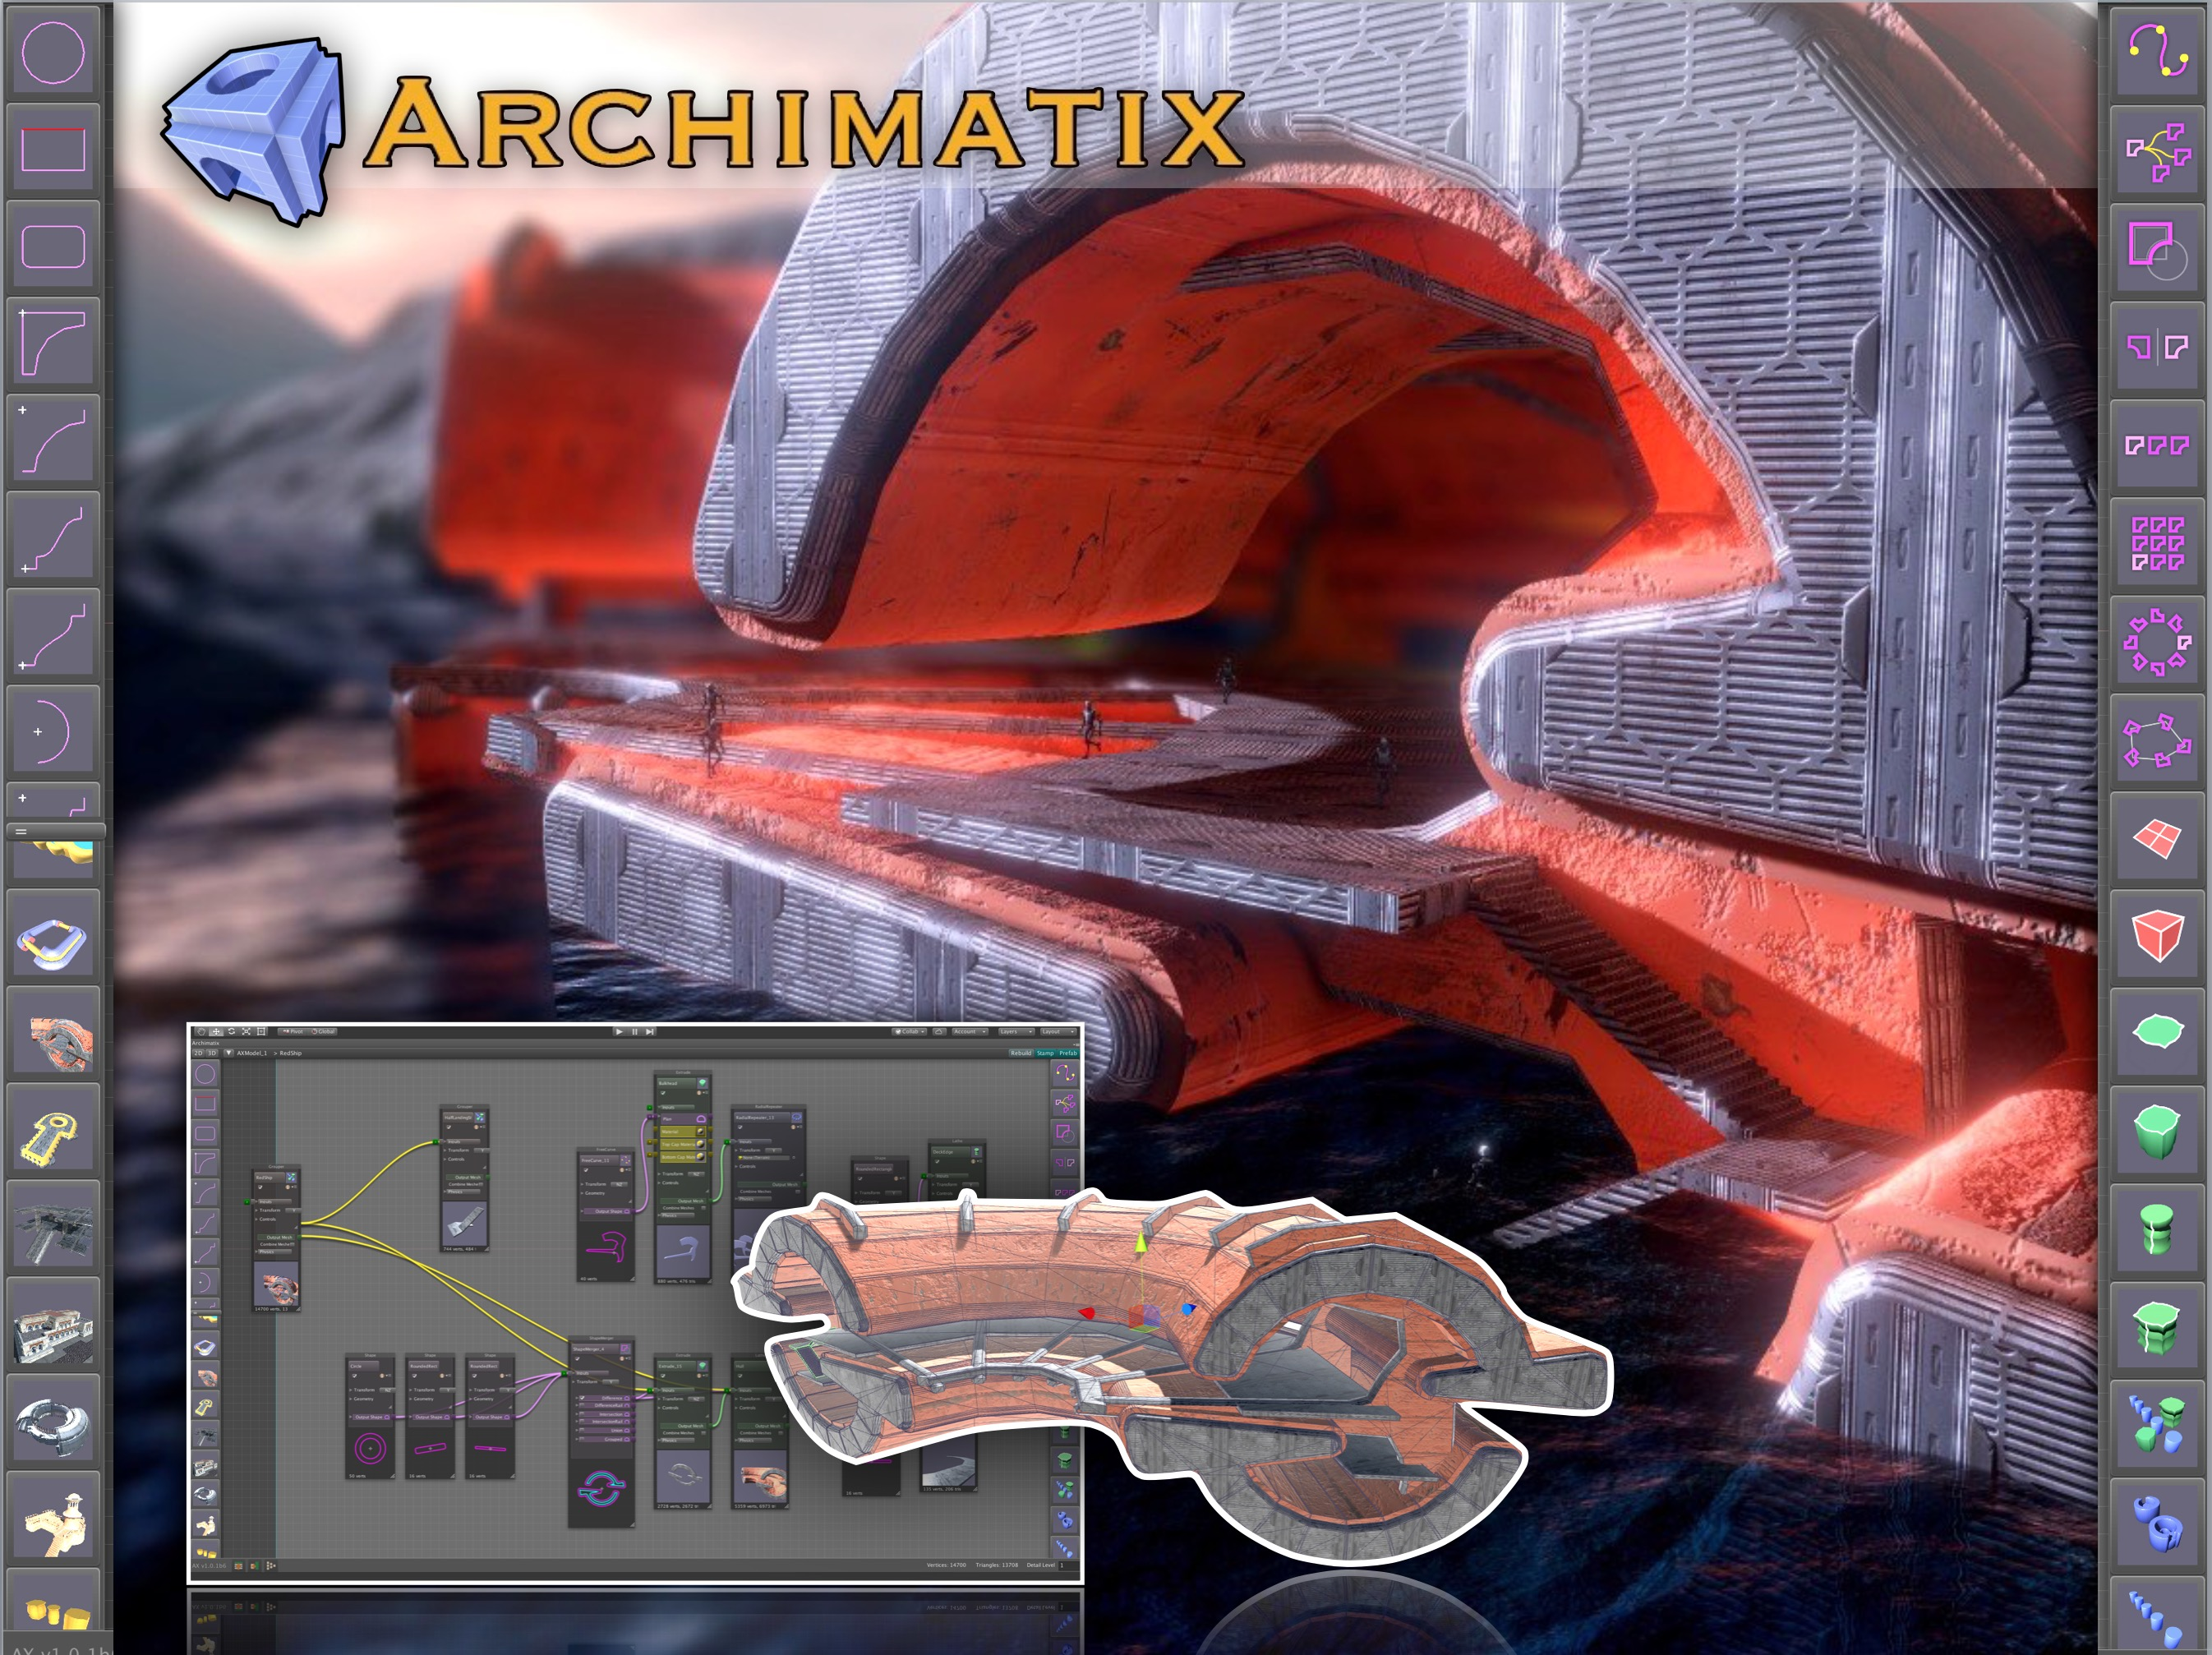 Archimatix 2017-03-31_10-32-40_PM.jpg